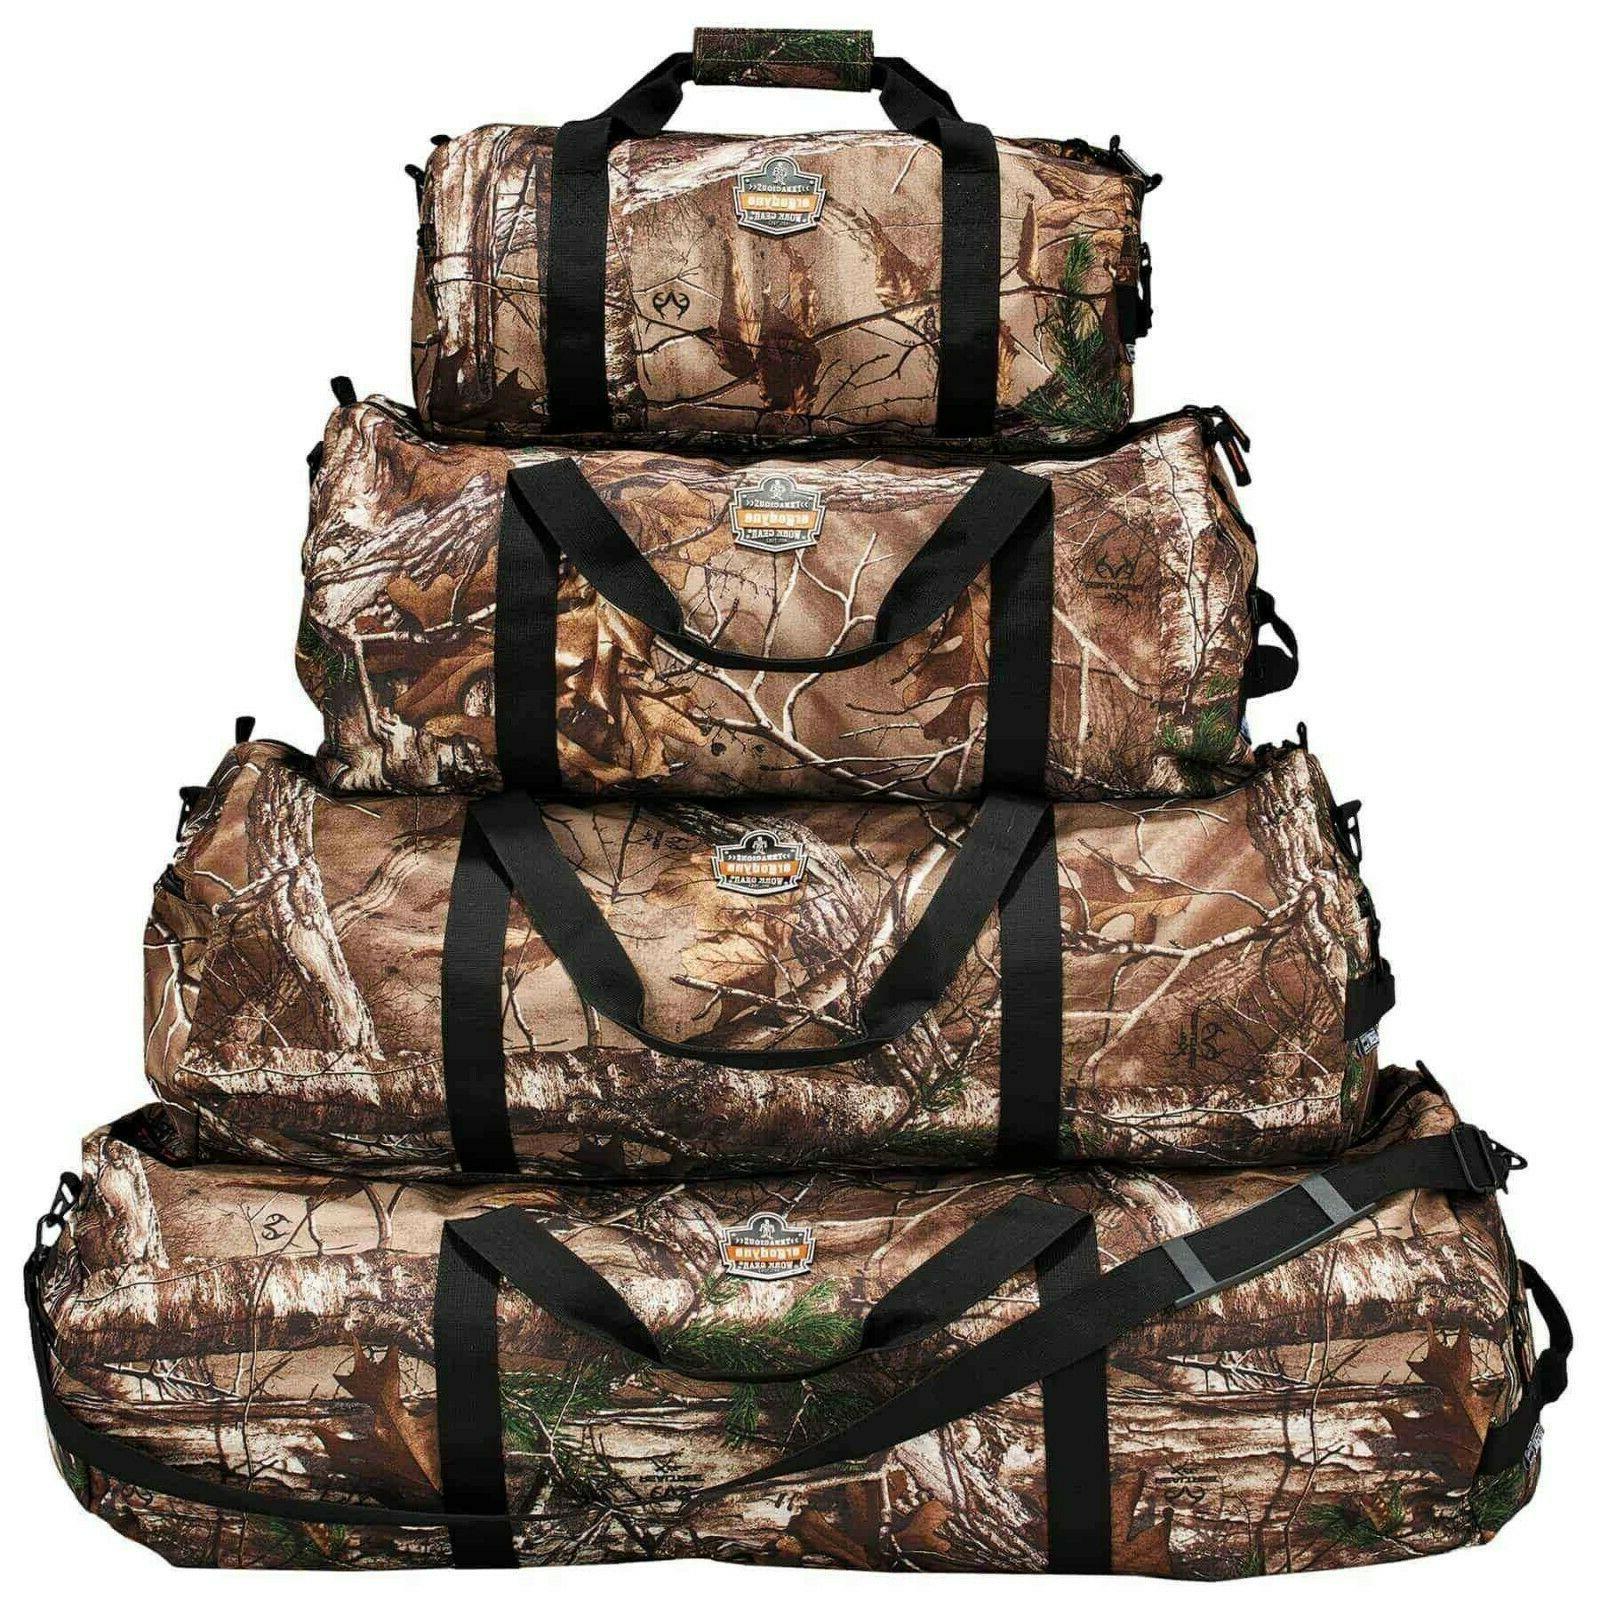 travel duffel bag hunting fishing gear realtree